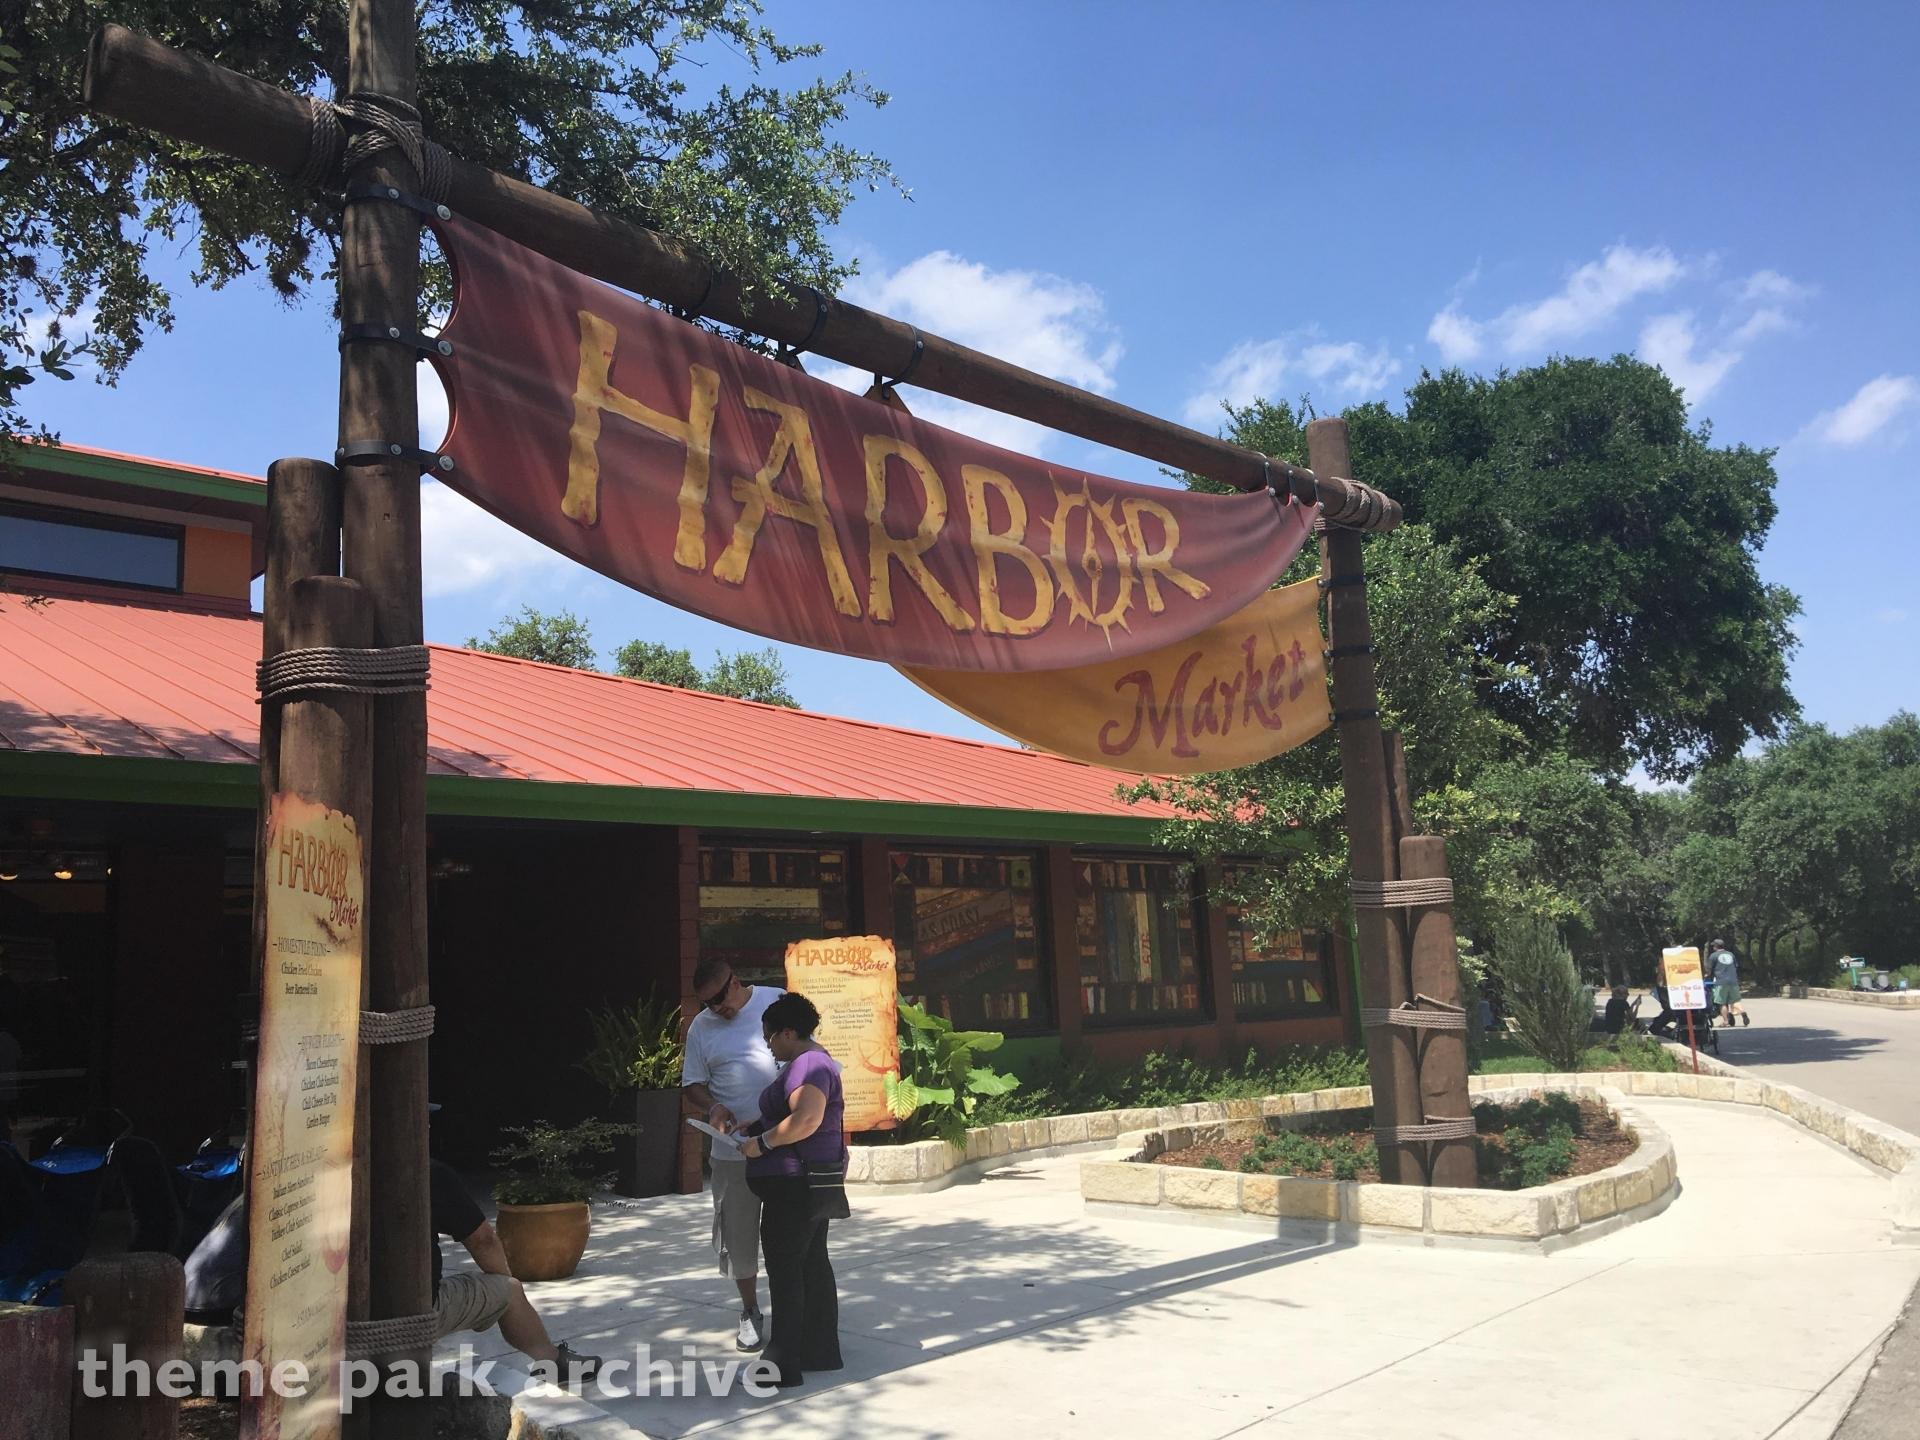 Harbor Market at SeaWorld San Antonio